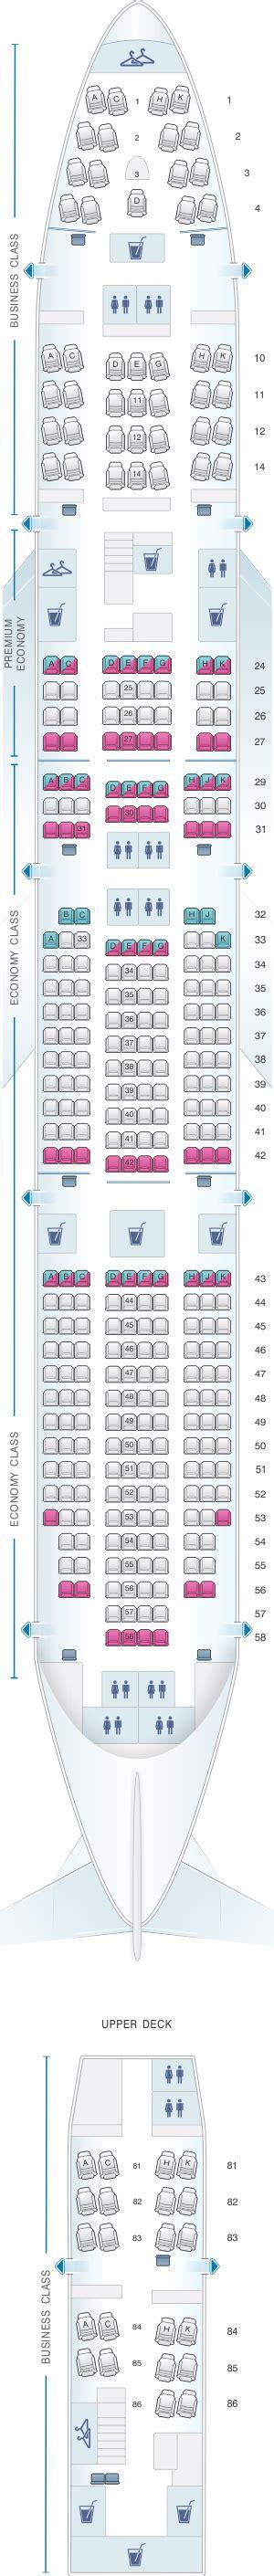 lufthansa boeing 747 400 seat map seat map lufthansa boeing b747 400 371pax seatmaestro